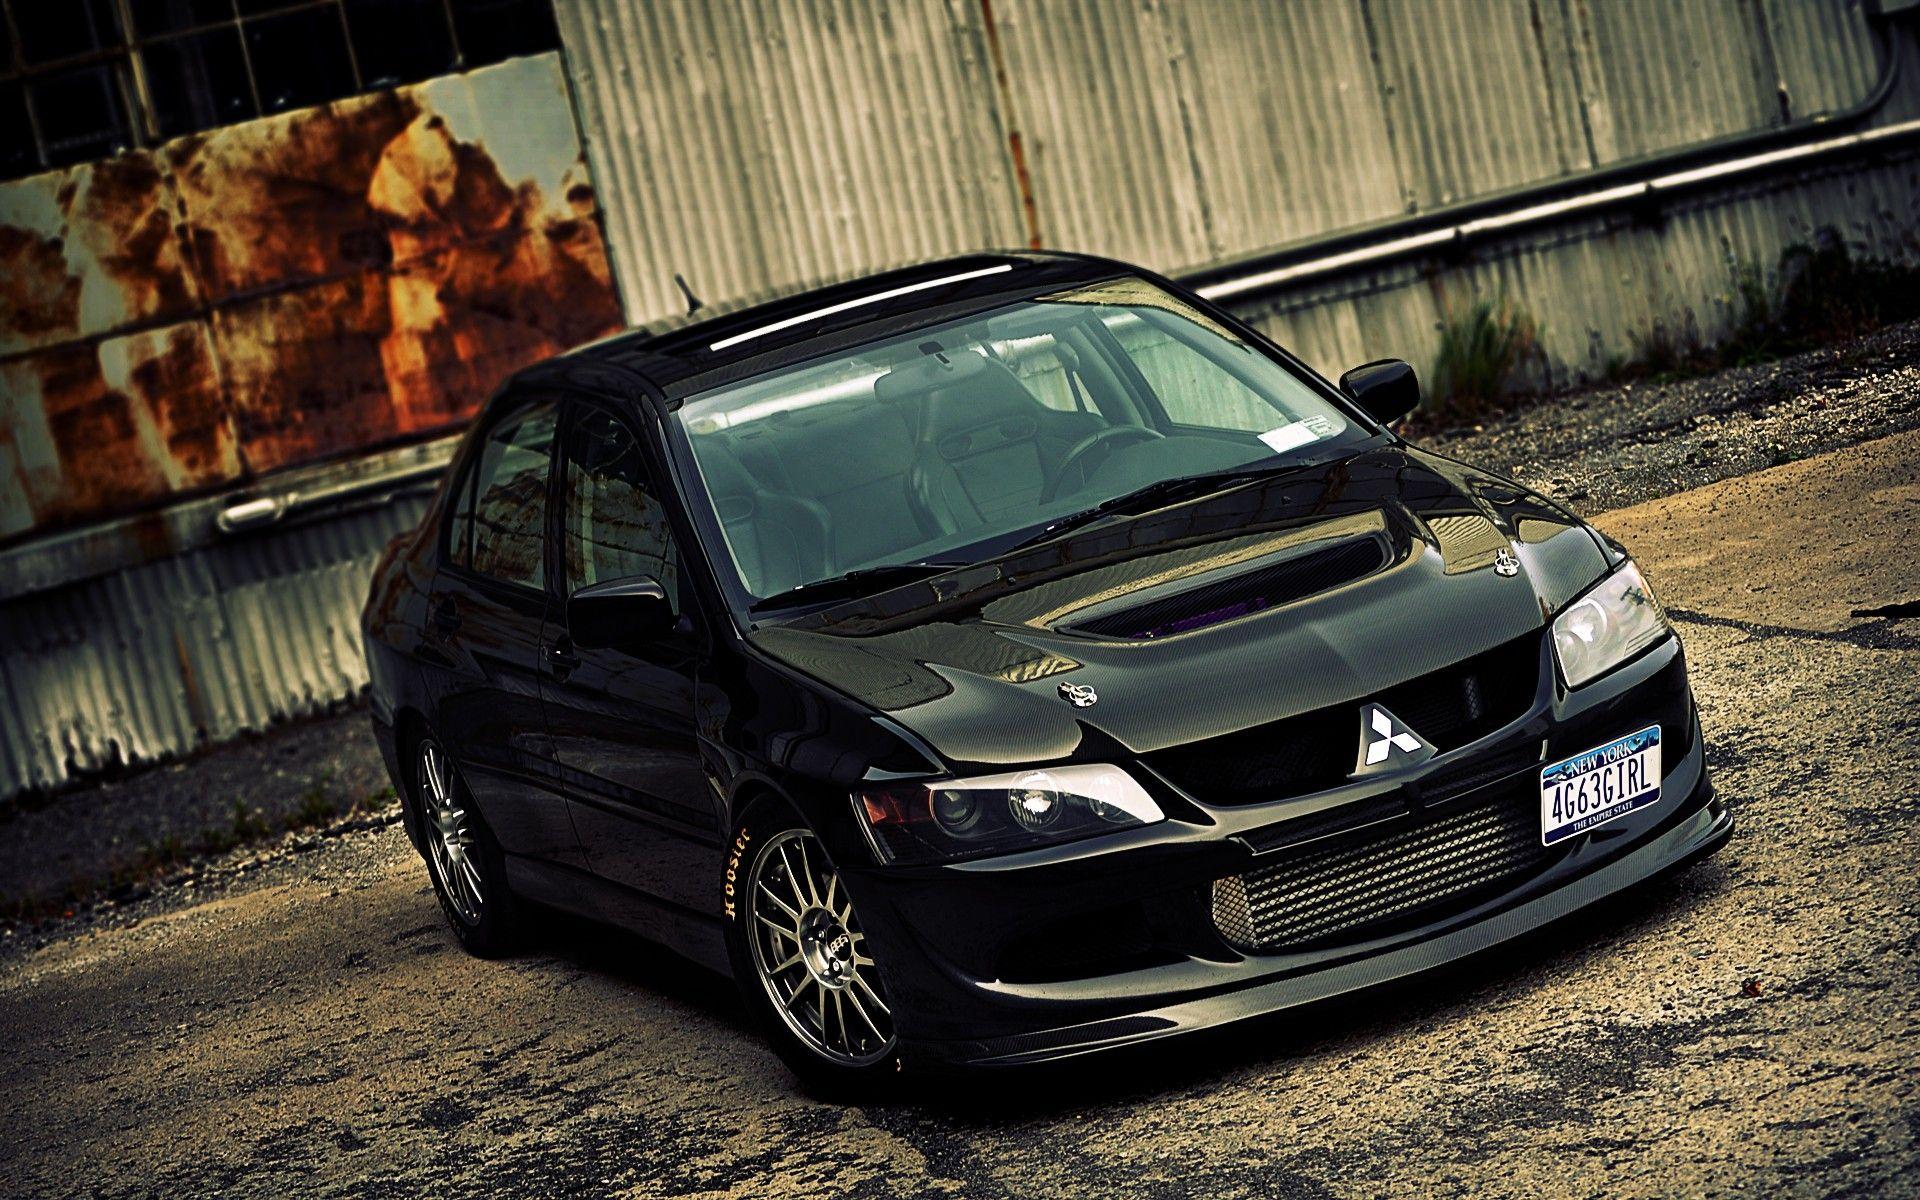 Mitsubishi Lancer Evolution Viii Desktop Wallpaper